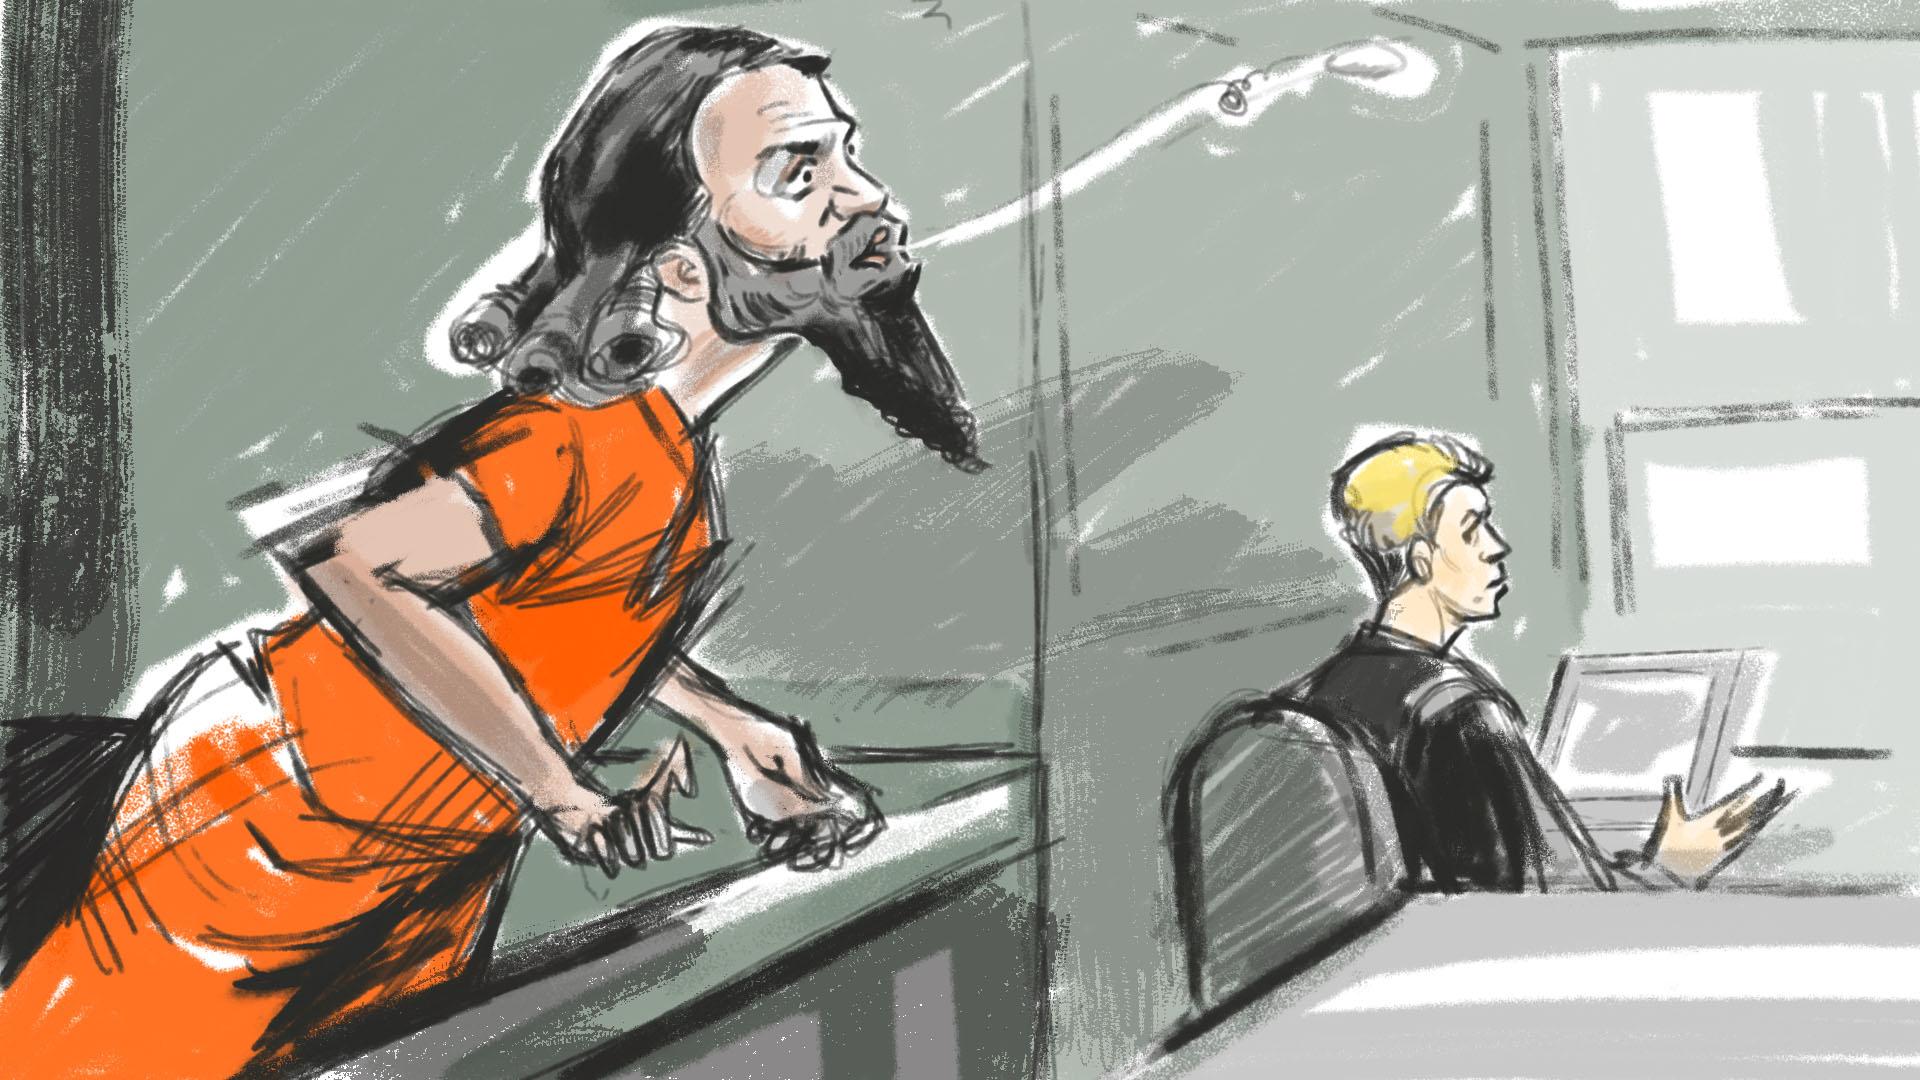 man found guilty in via rail terror plot fit for sentencing man found guilty in via rail terror plot fit for sentencing psychiatrist